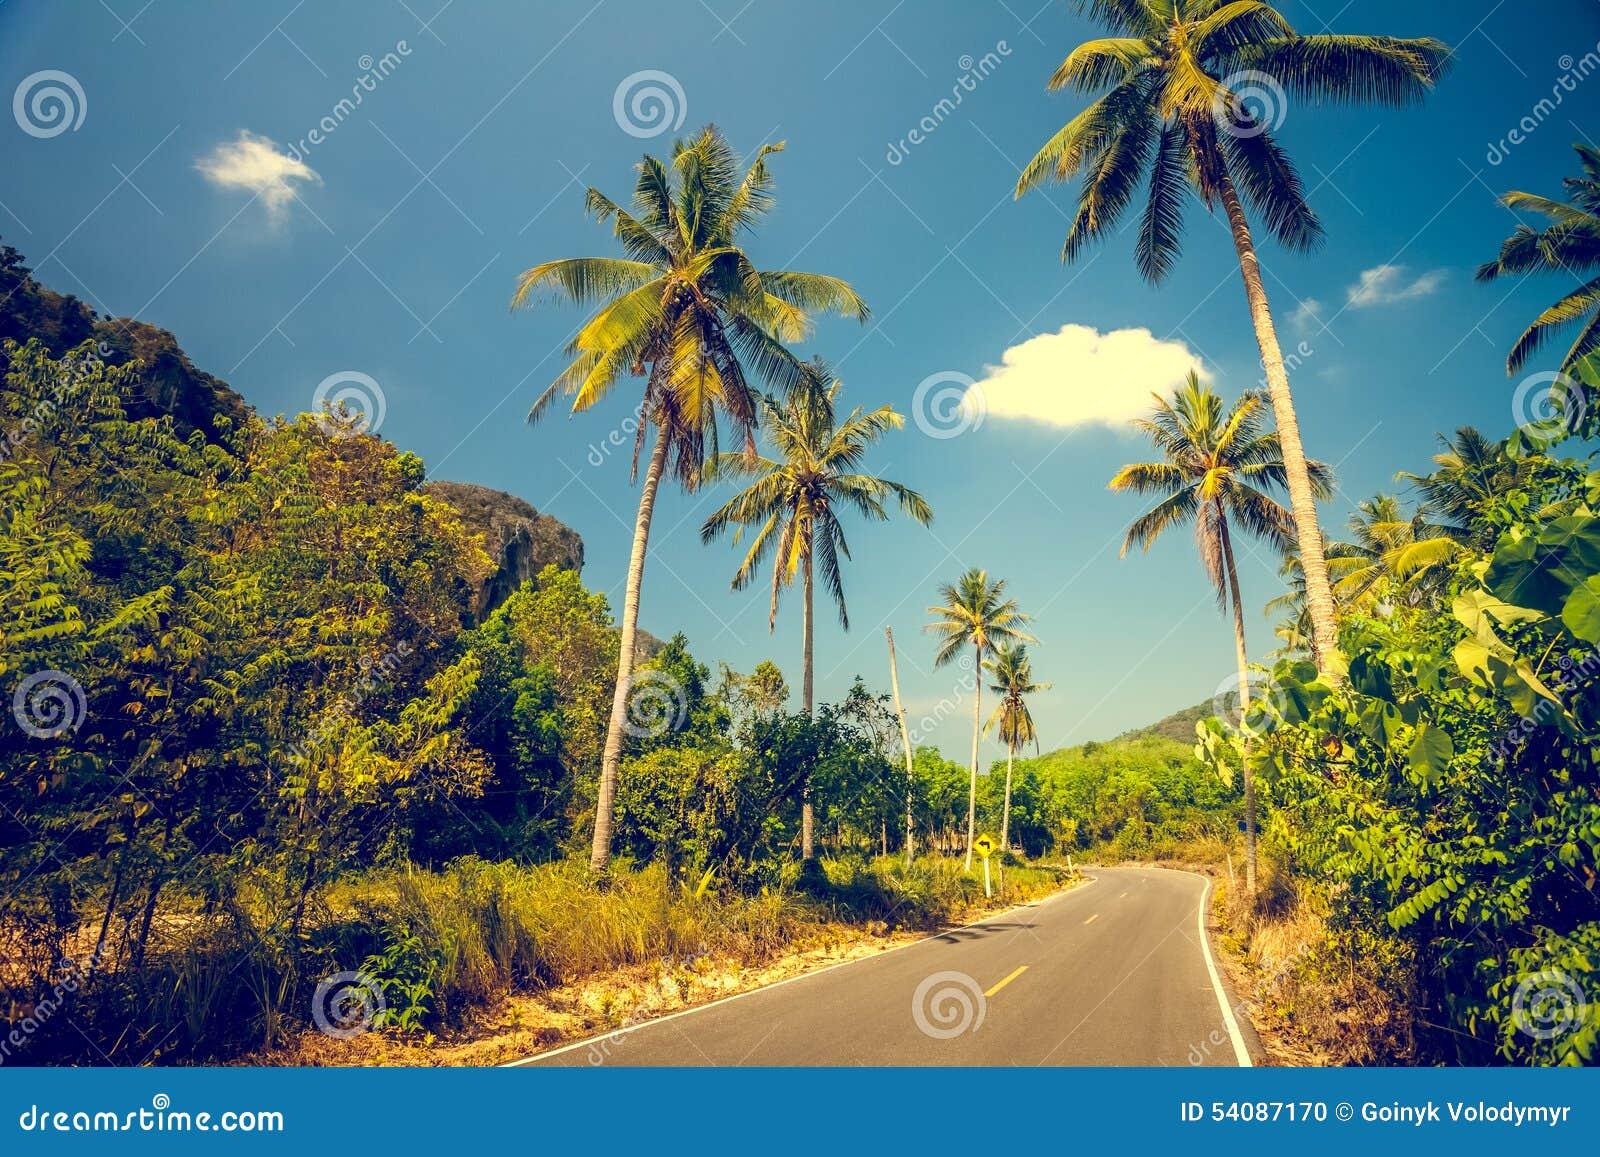 Asfaltweg met palmen